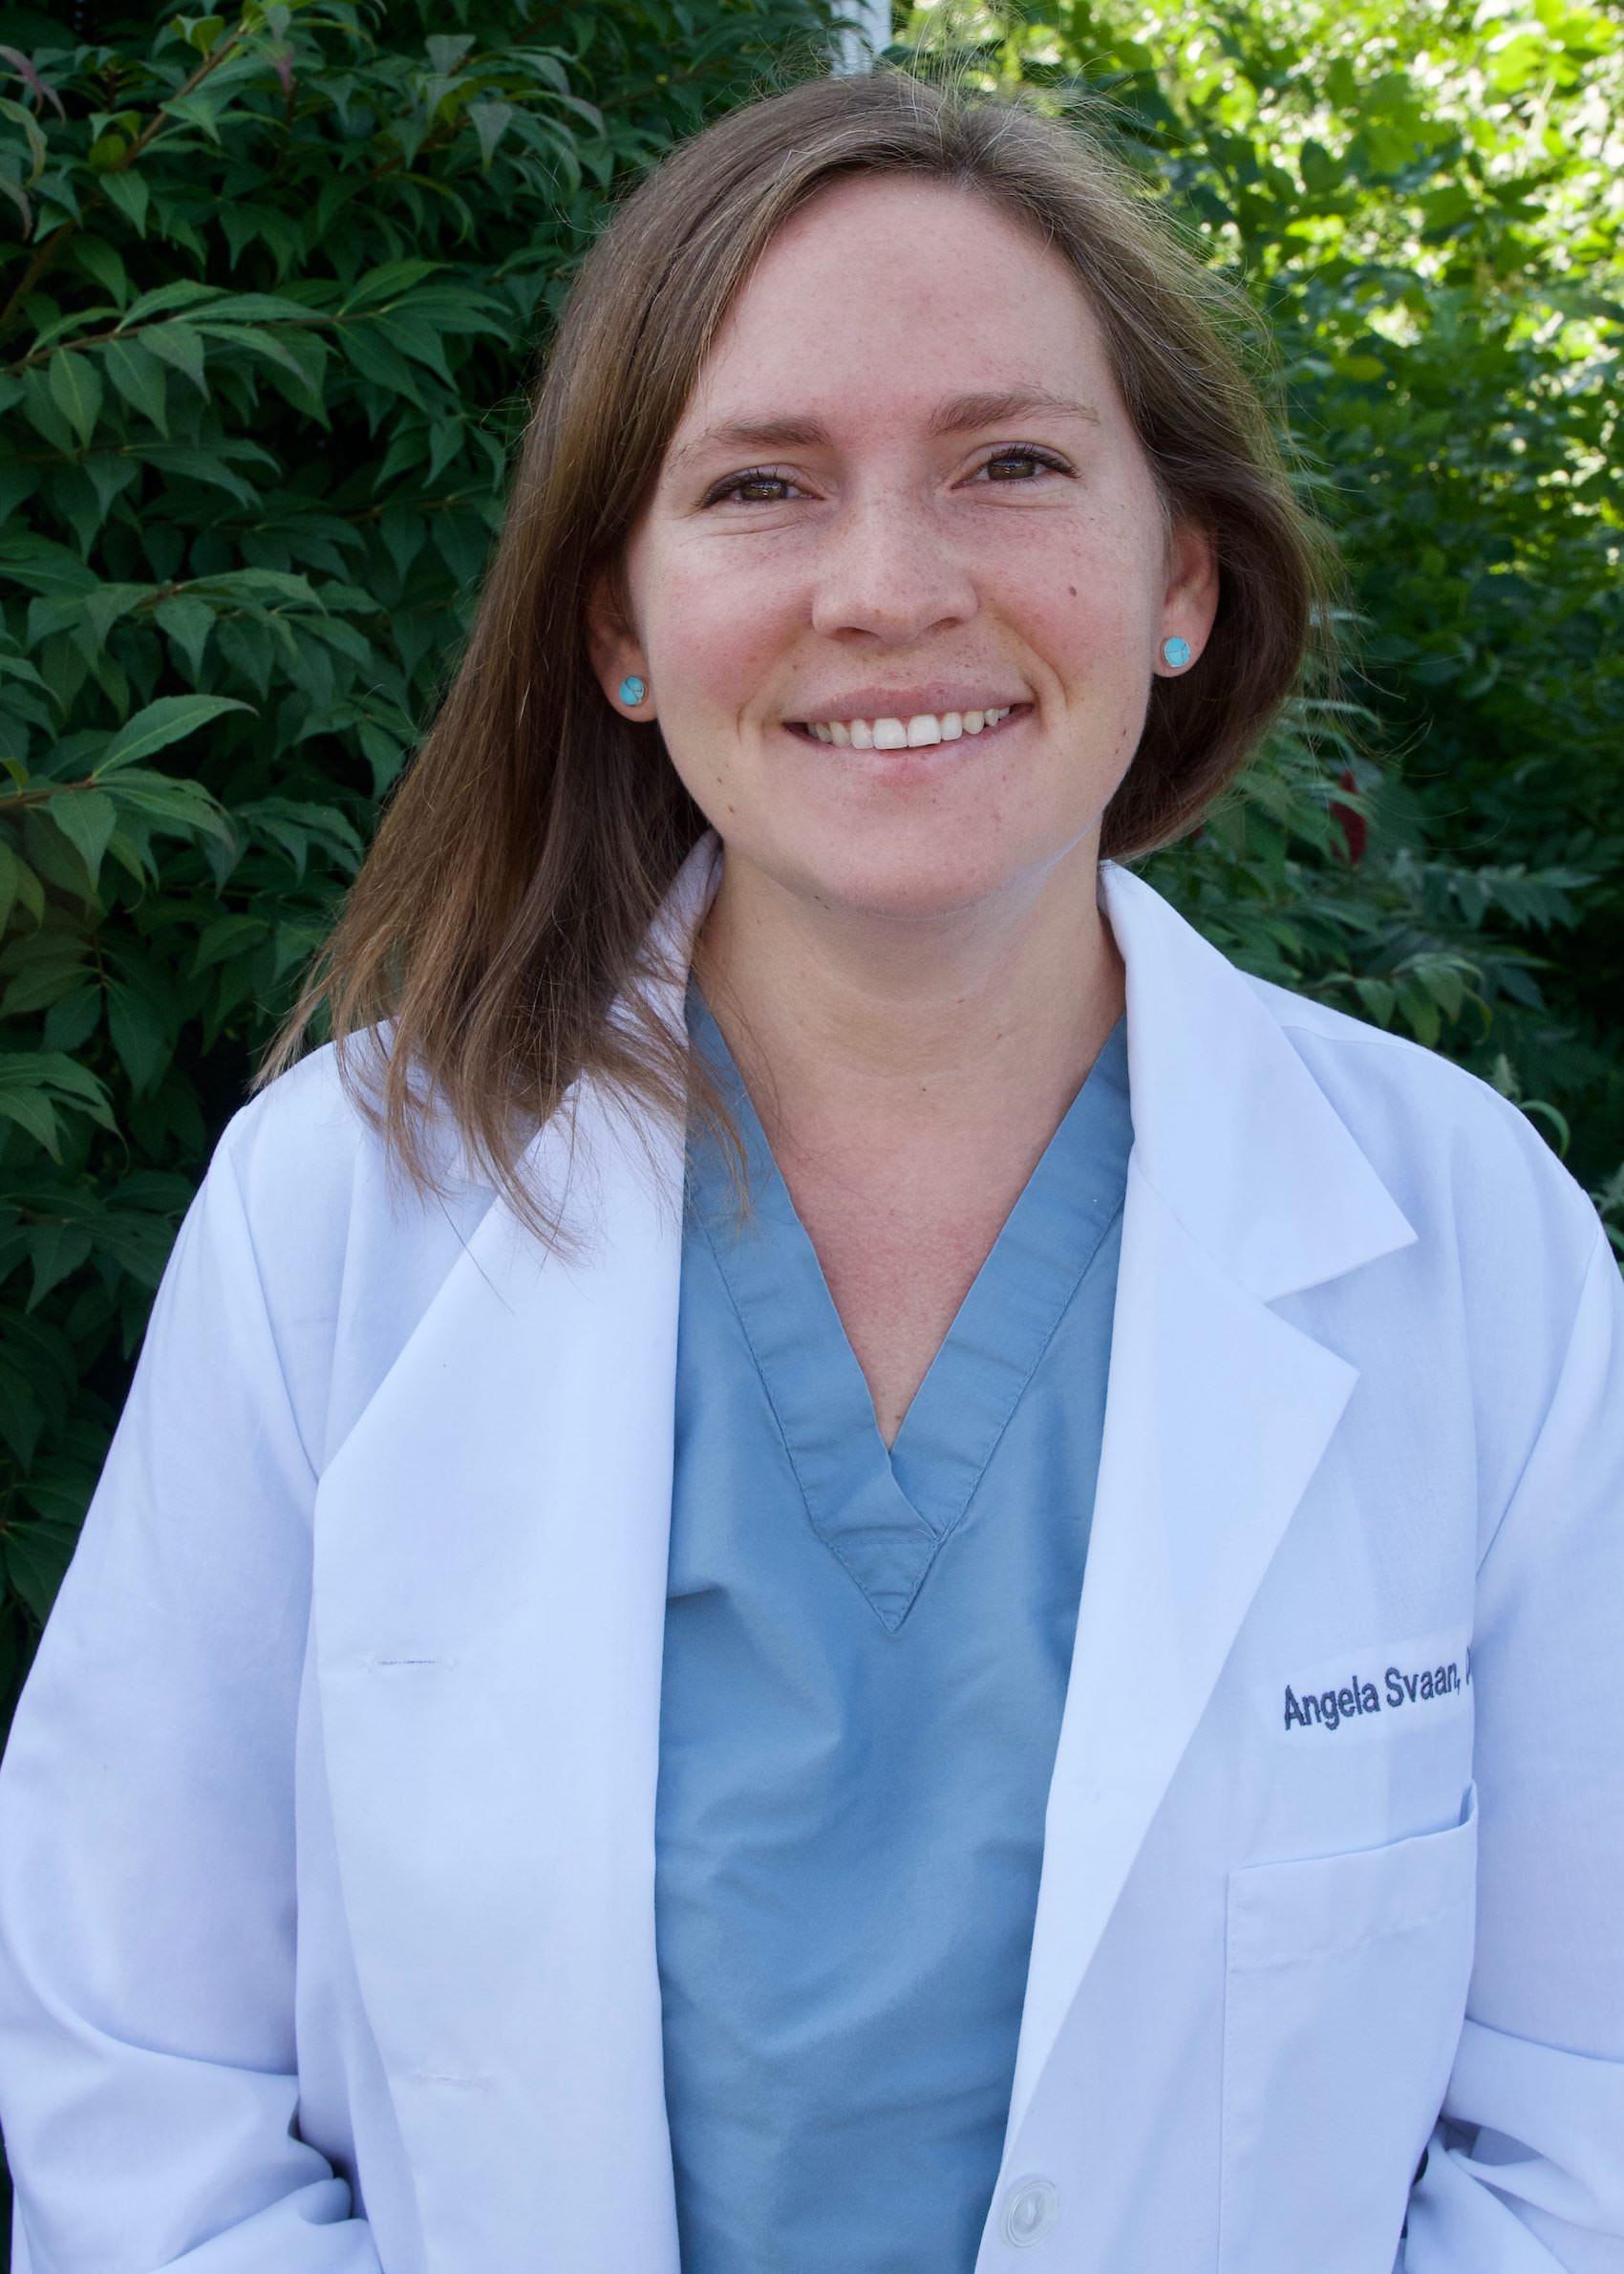 Dr. Angela Svann, DDS